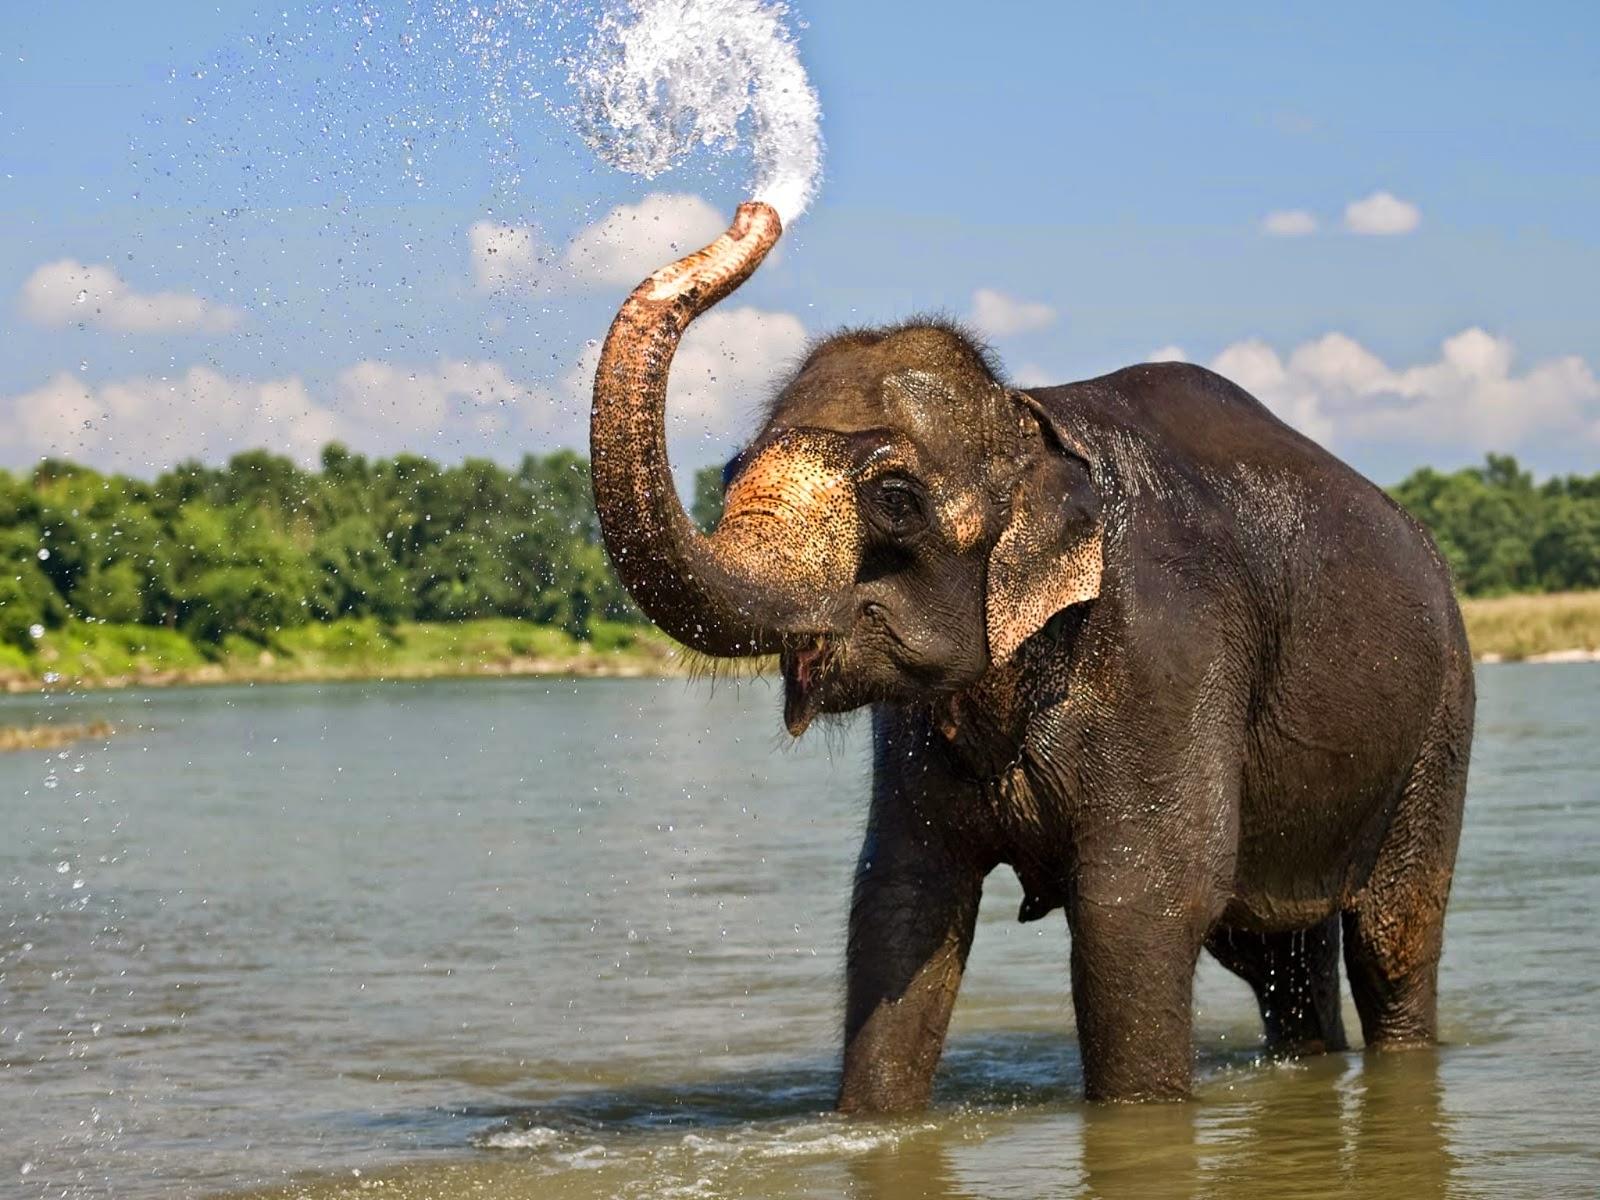 Beautiful elephant images hd wallpaper all 4u wallpaper - Image elephant ...